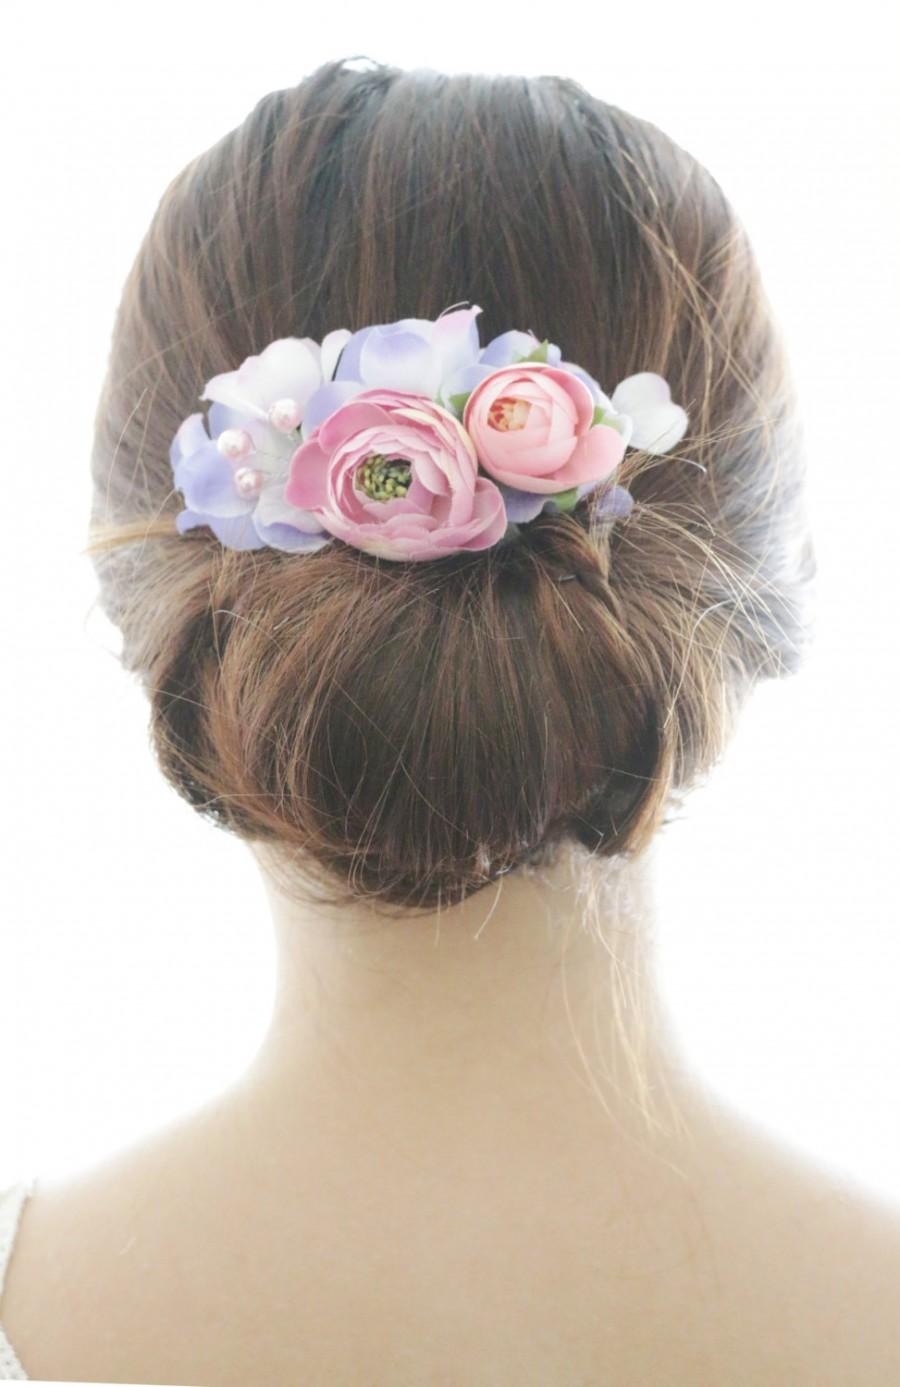 Mariage - Bridal Hair Accessory, pink ranunculus & purple Hydrangea, Bridal Hair comb hairpiece flower, Bridesmaid, Rustic outdoor wedding woodland